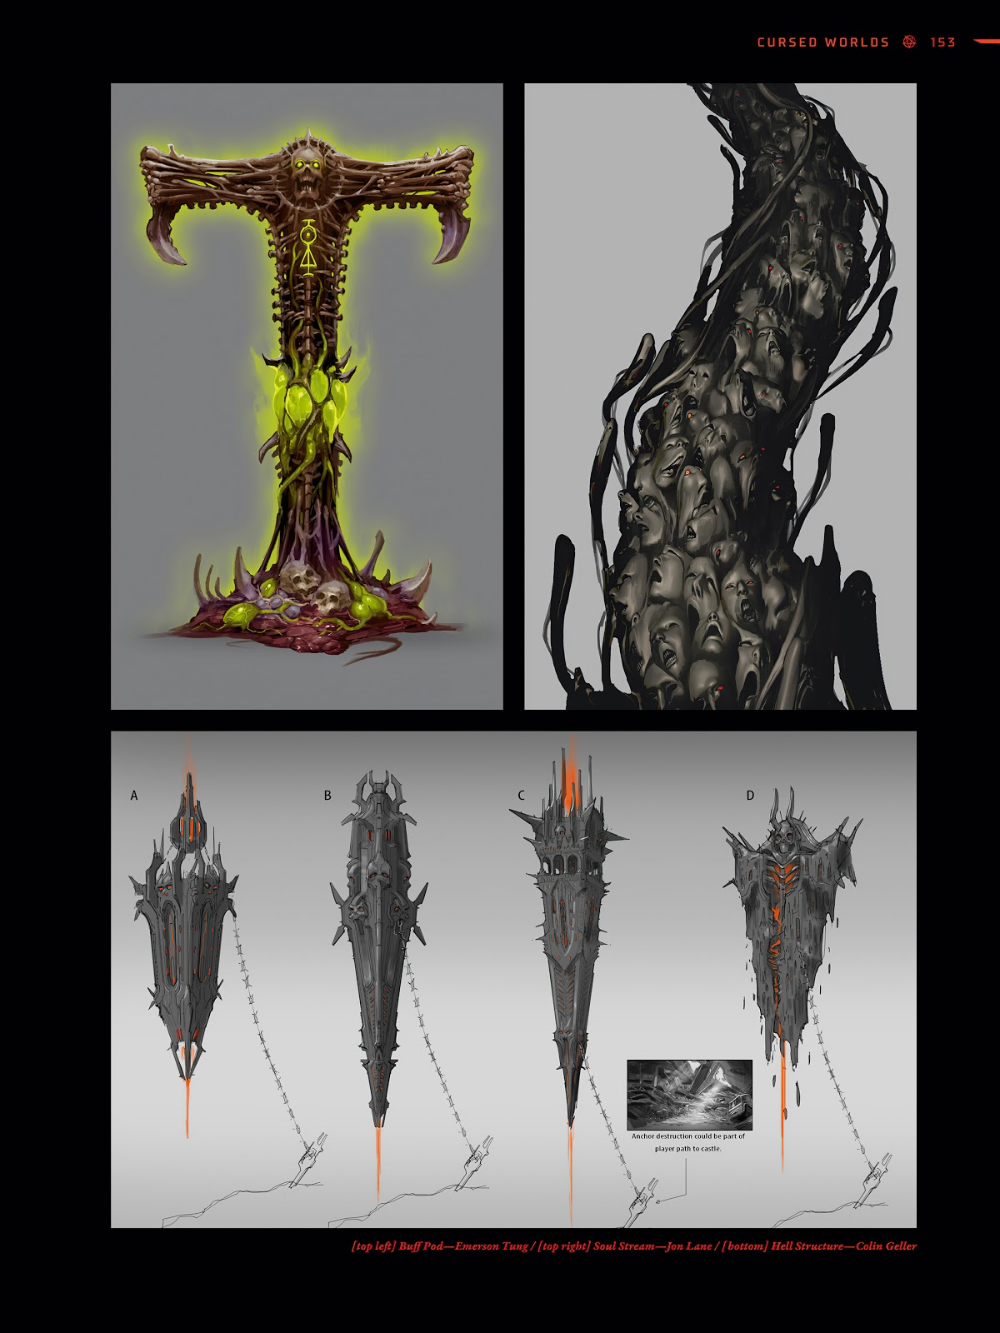 The Art Of Doom Eternal Tpb Part 2 Read The Art Of Doom Eternal Tpb Part 2 Comic Online In High Quality Art Dark Fantasy Demon Art